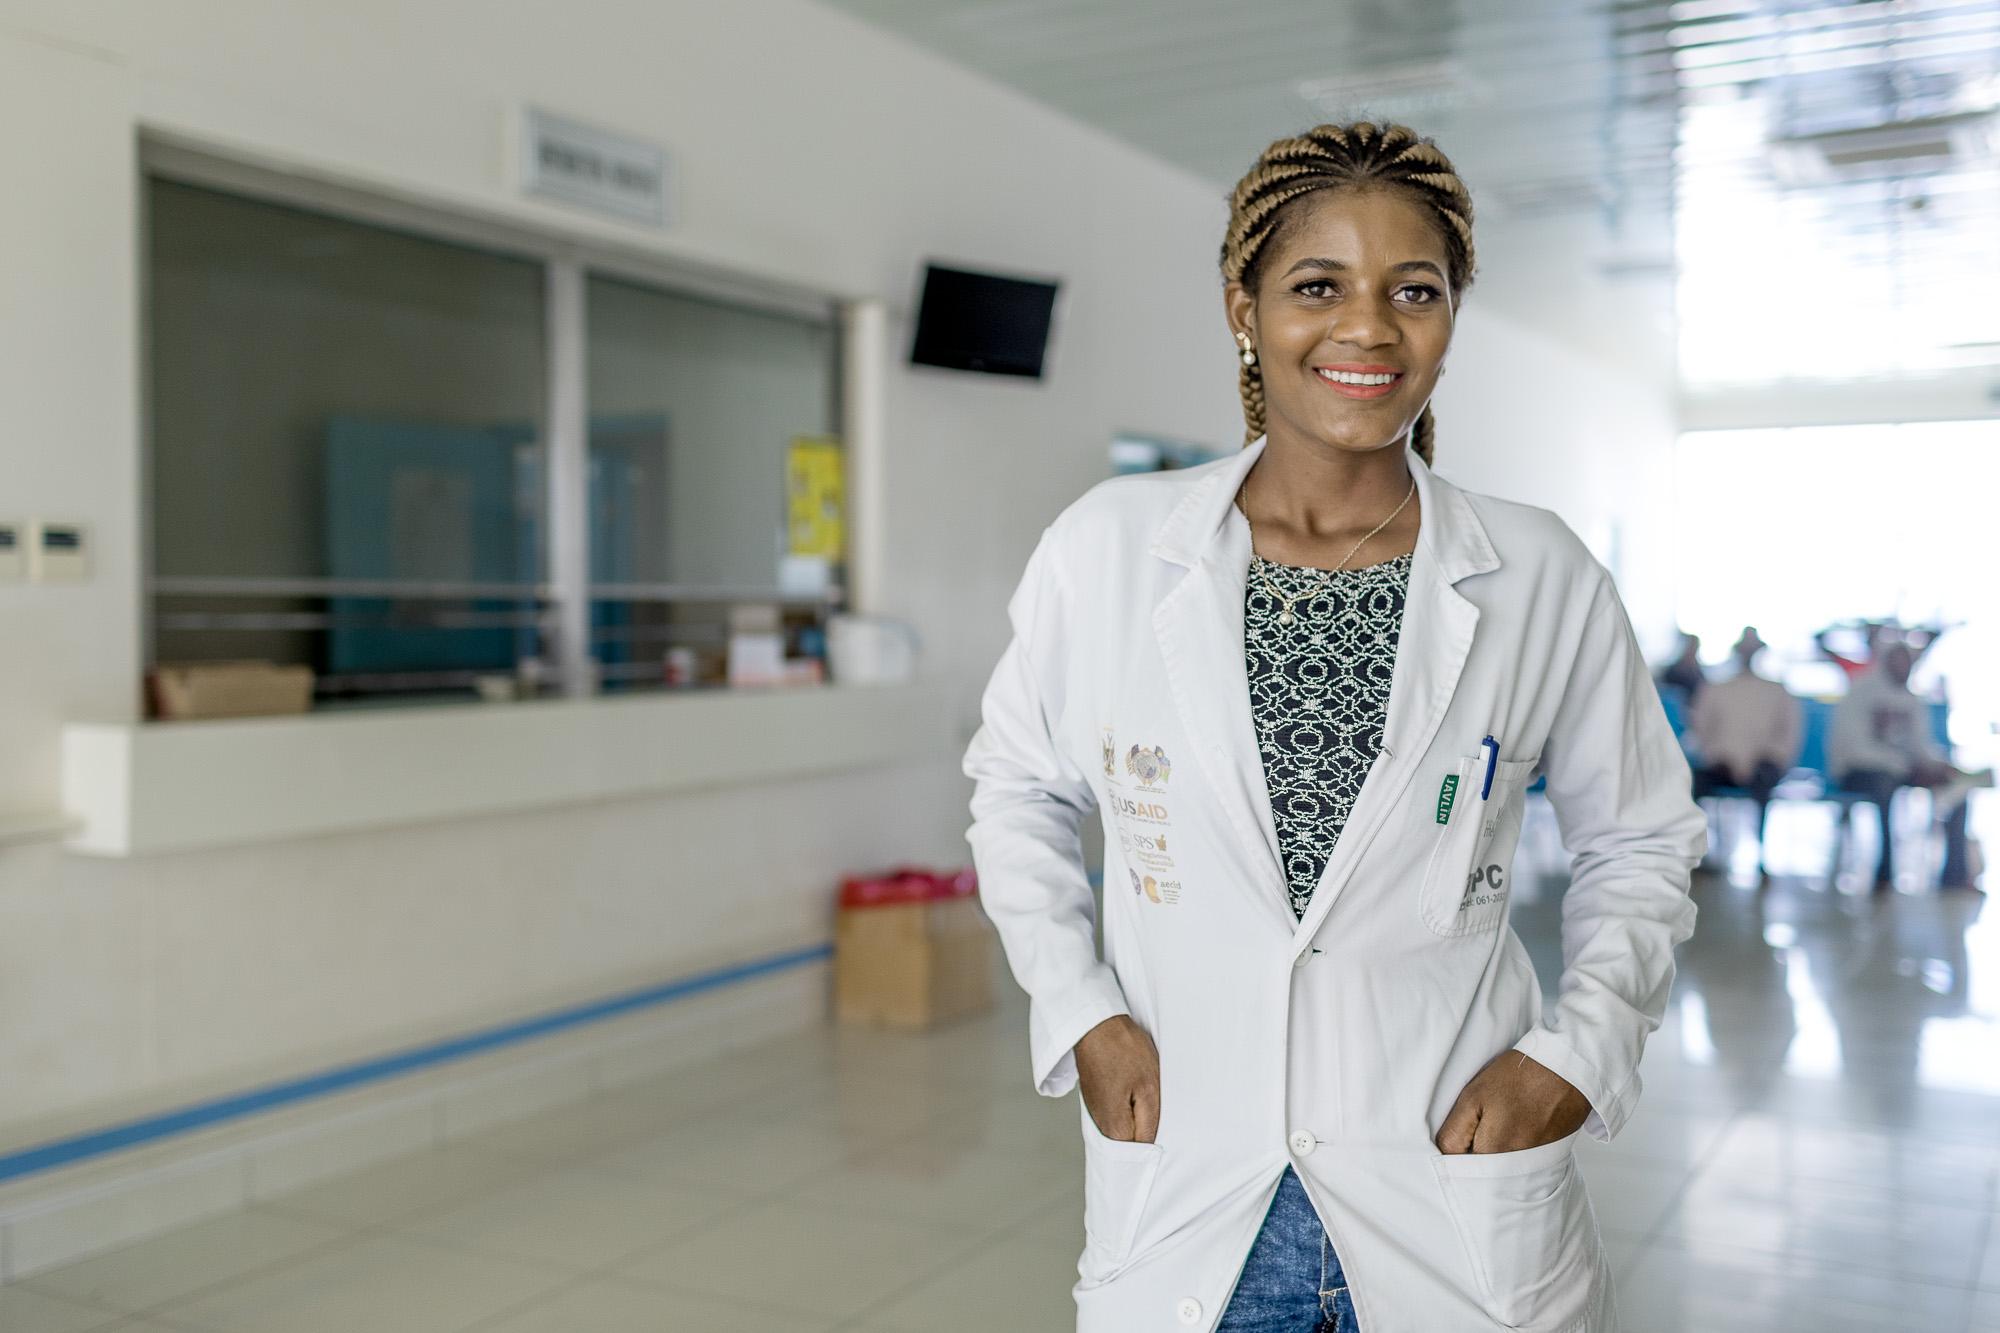 Elina Nantinda, 25, an assistant pharmacist